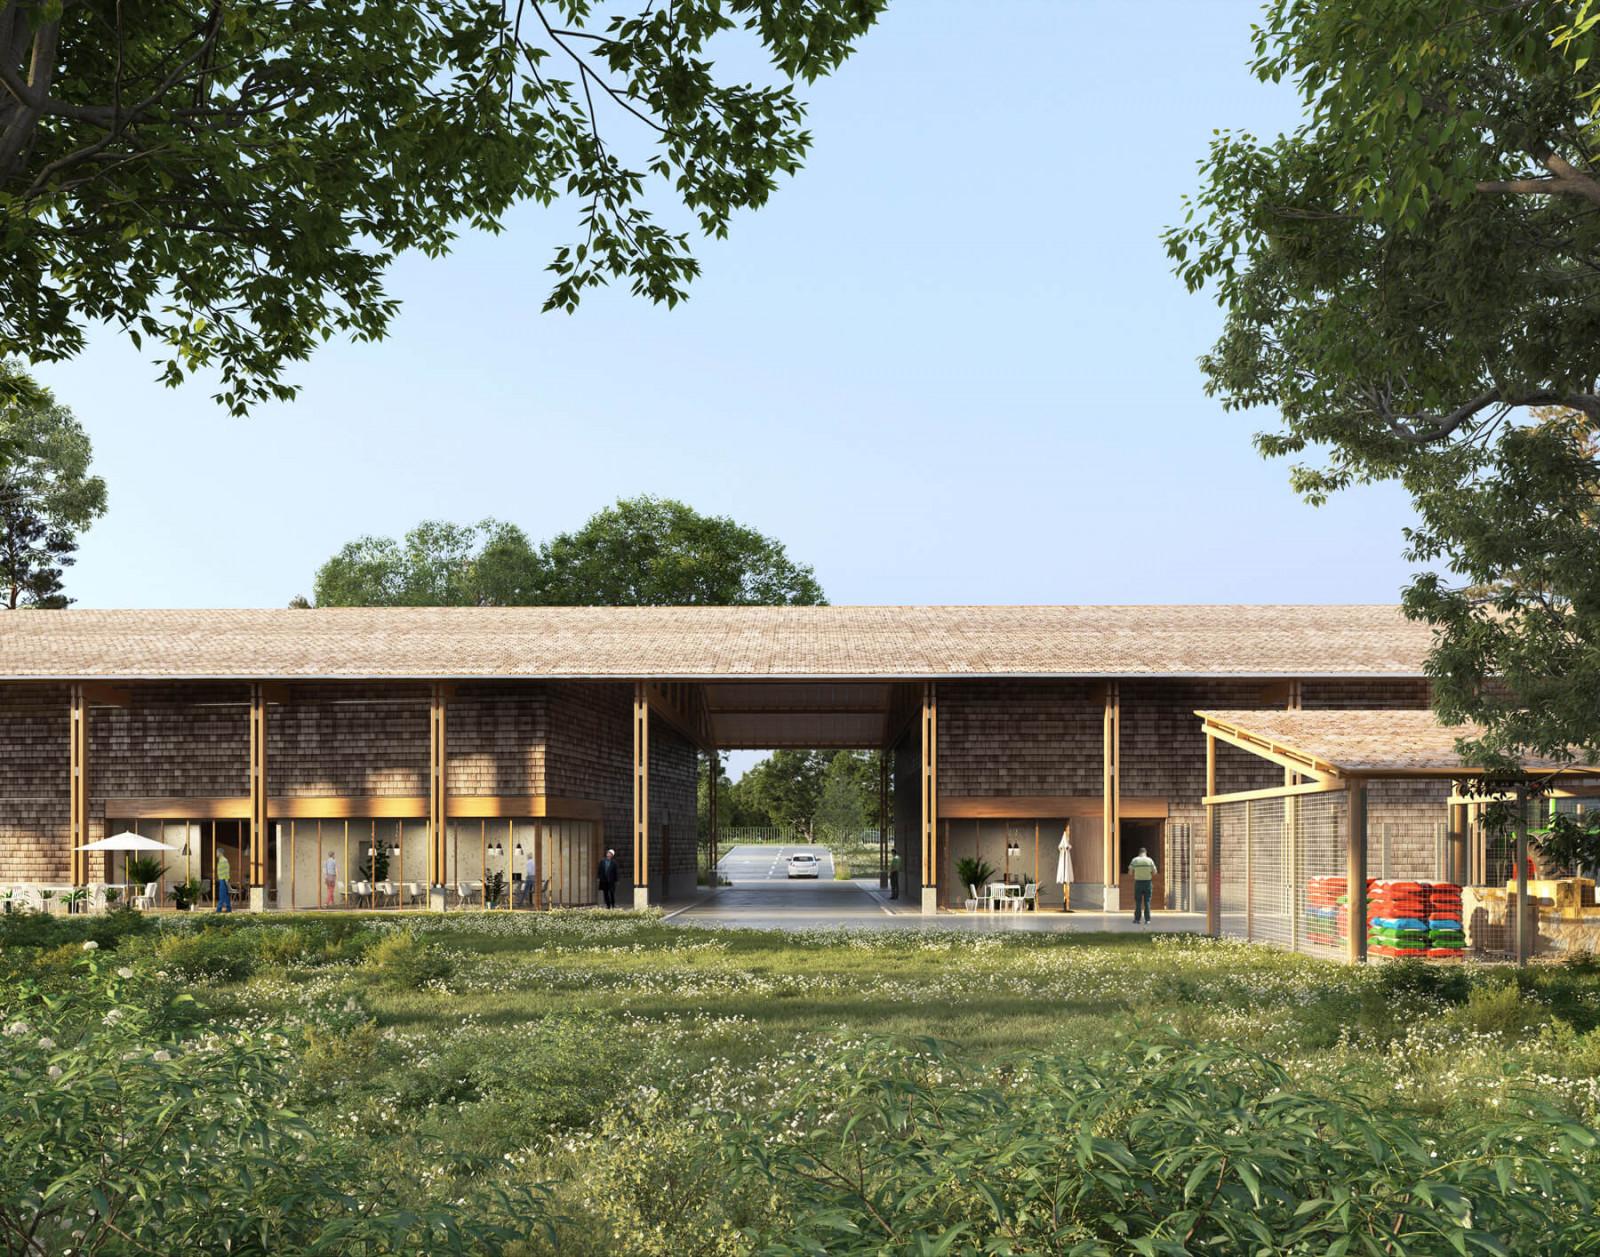 graam-onf-02-bureaux-haguenau-hangar-bois-foret-vegetation